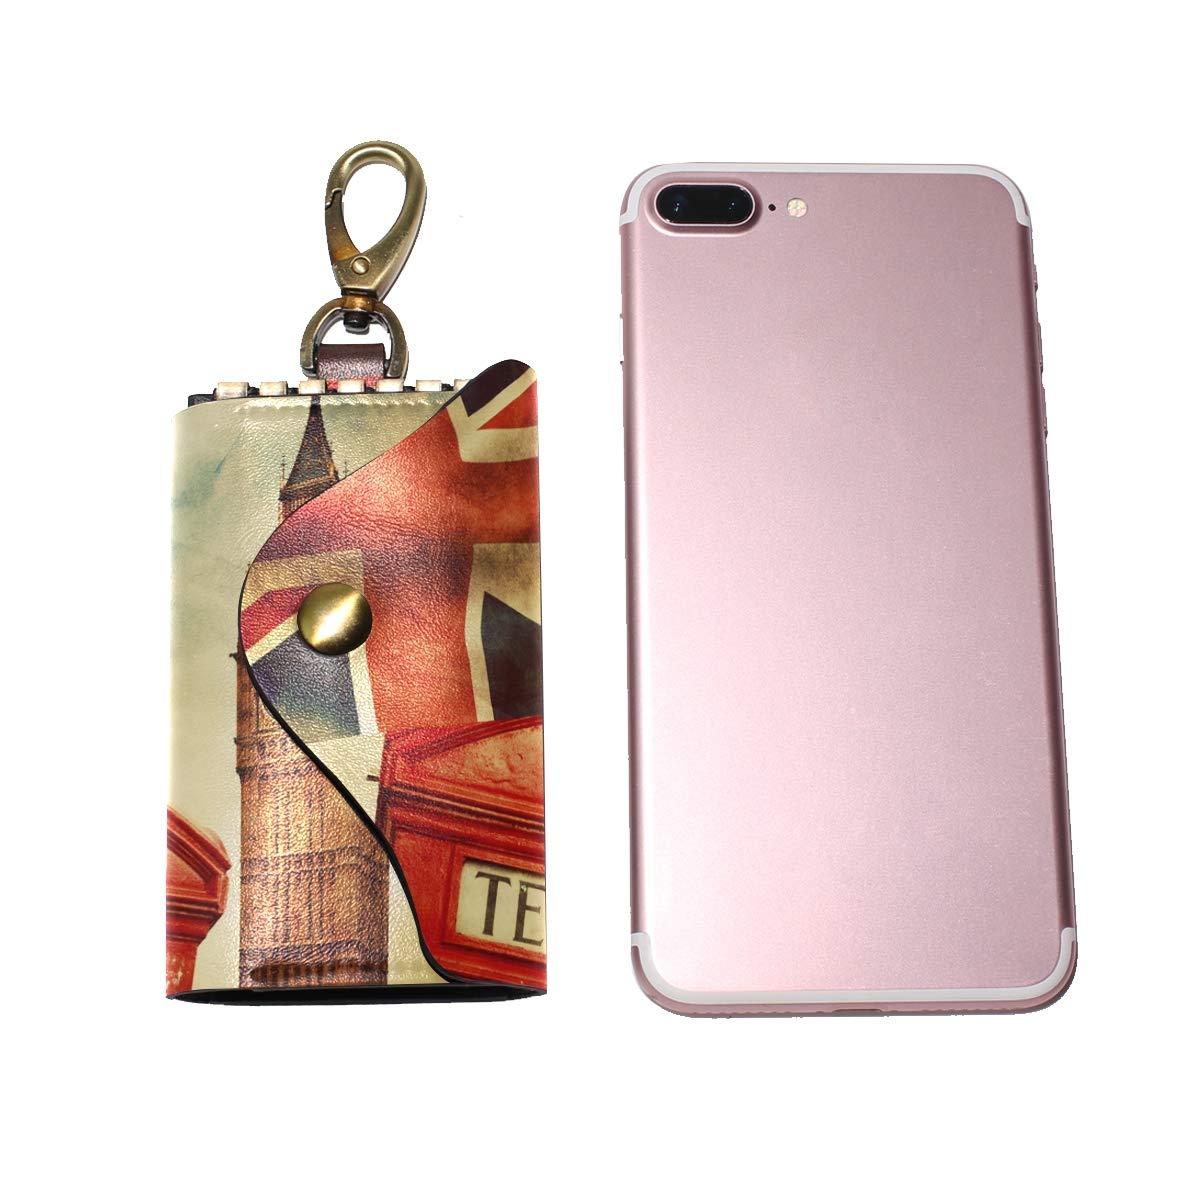 KEAKIA Union Jack Flag Leather Key Case Wallets Tri-fold Key Holder Keychains with 6 Hooks 2 Slot Snap Closure for Men Women